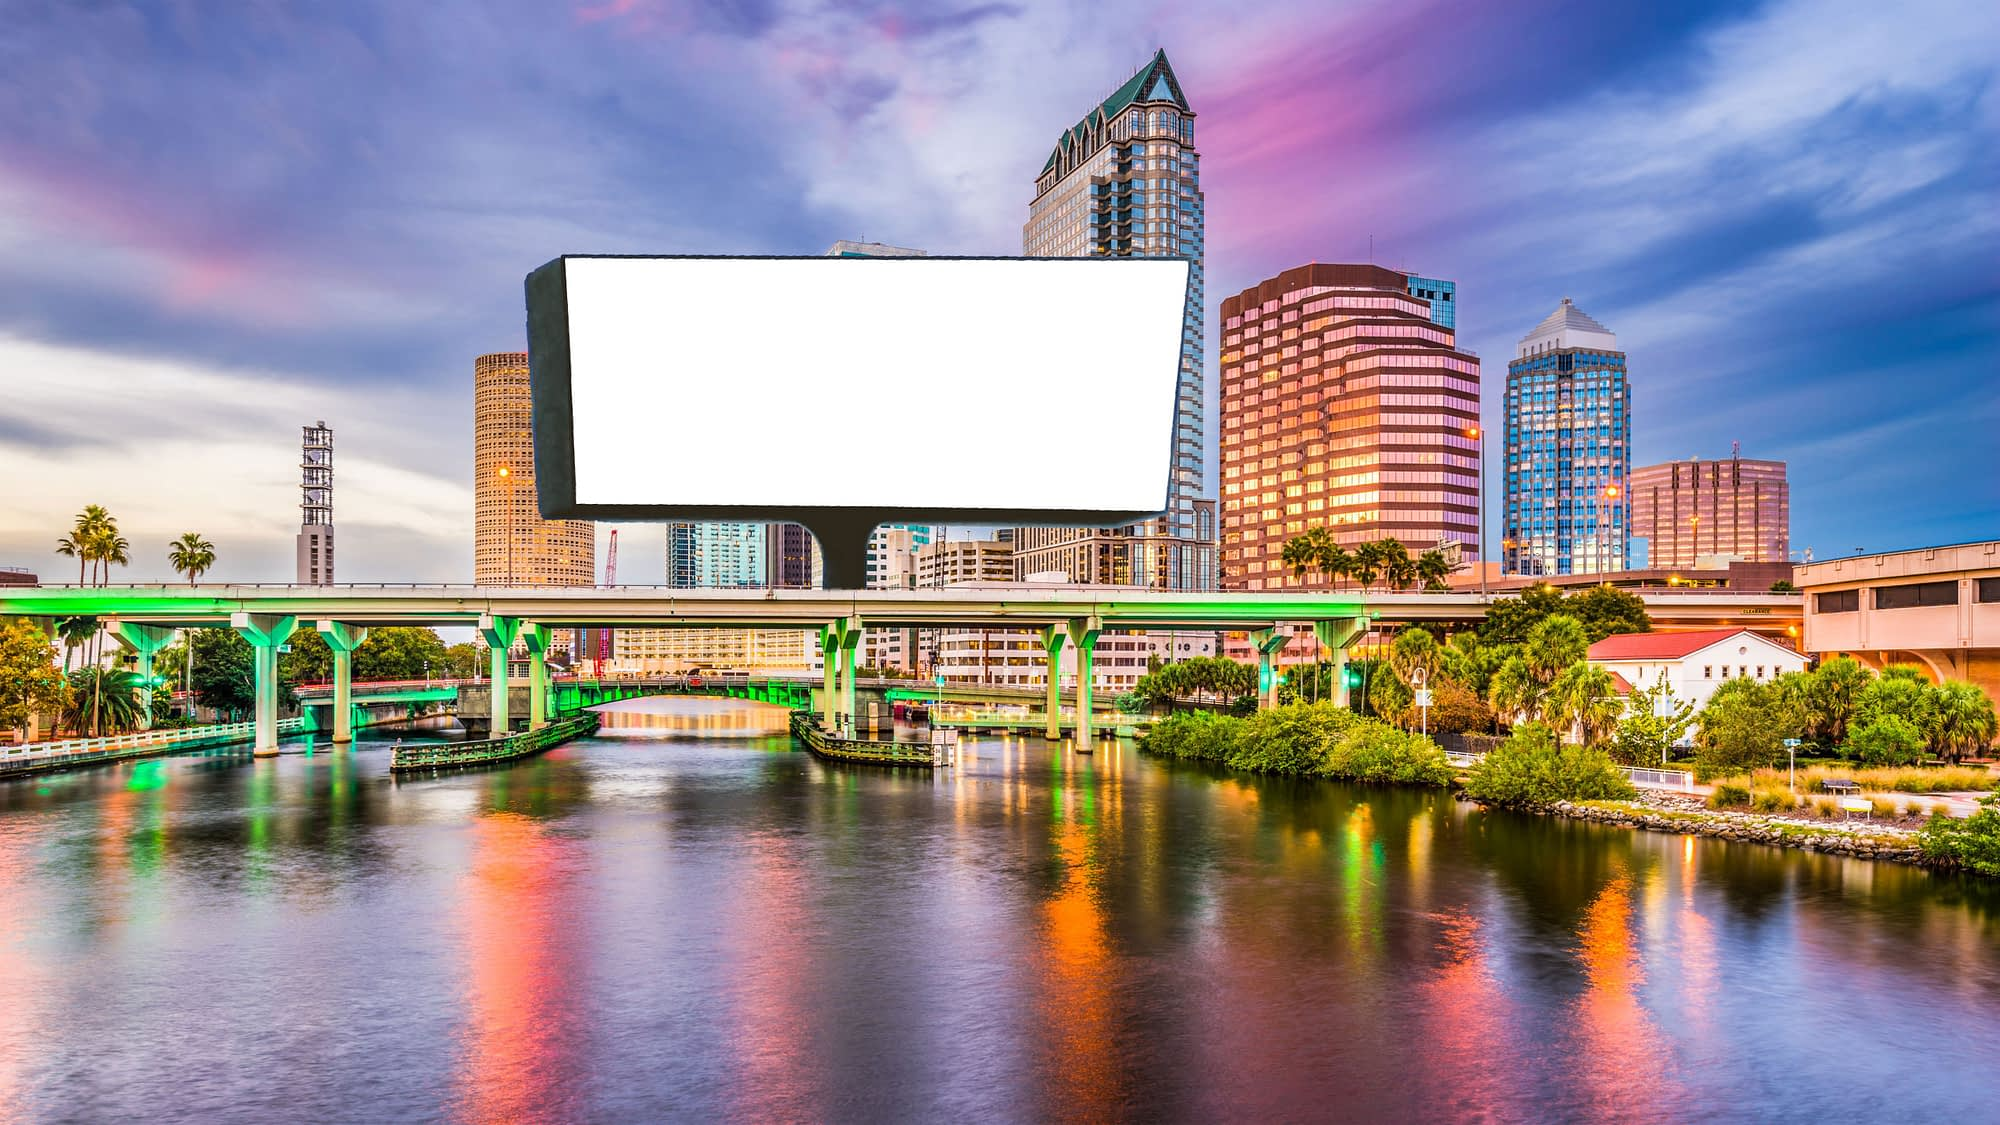 Tampa City Skyline Background scaled 1